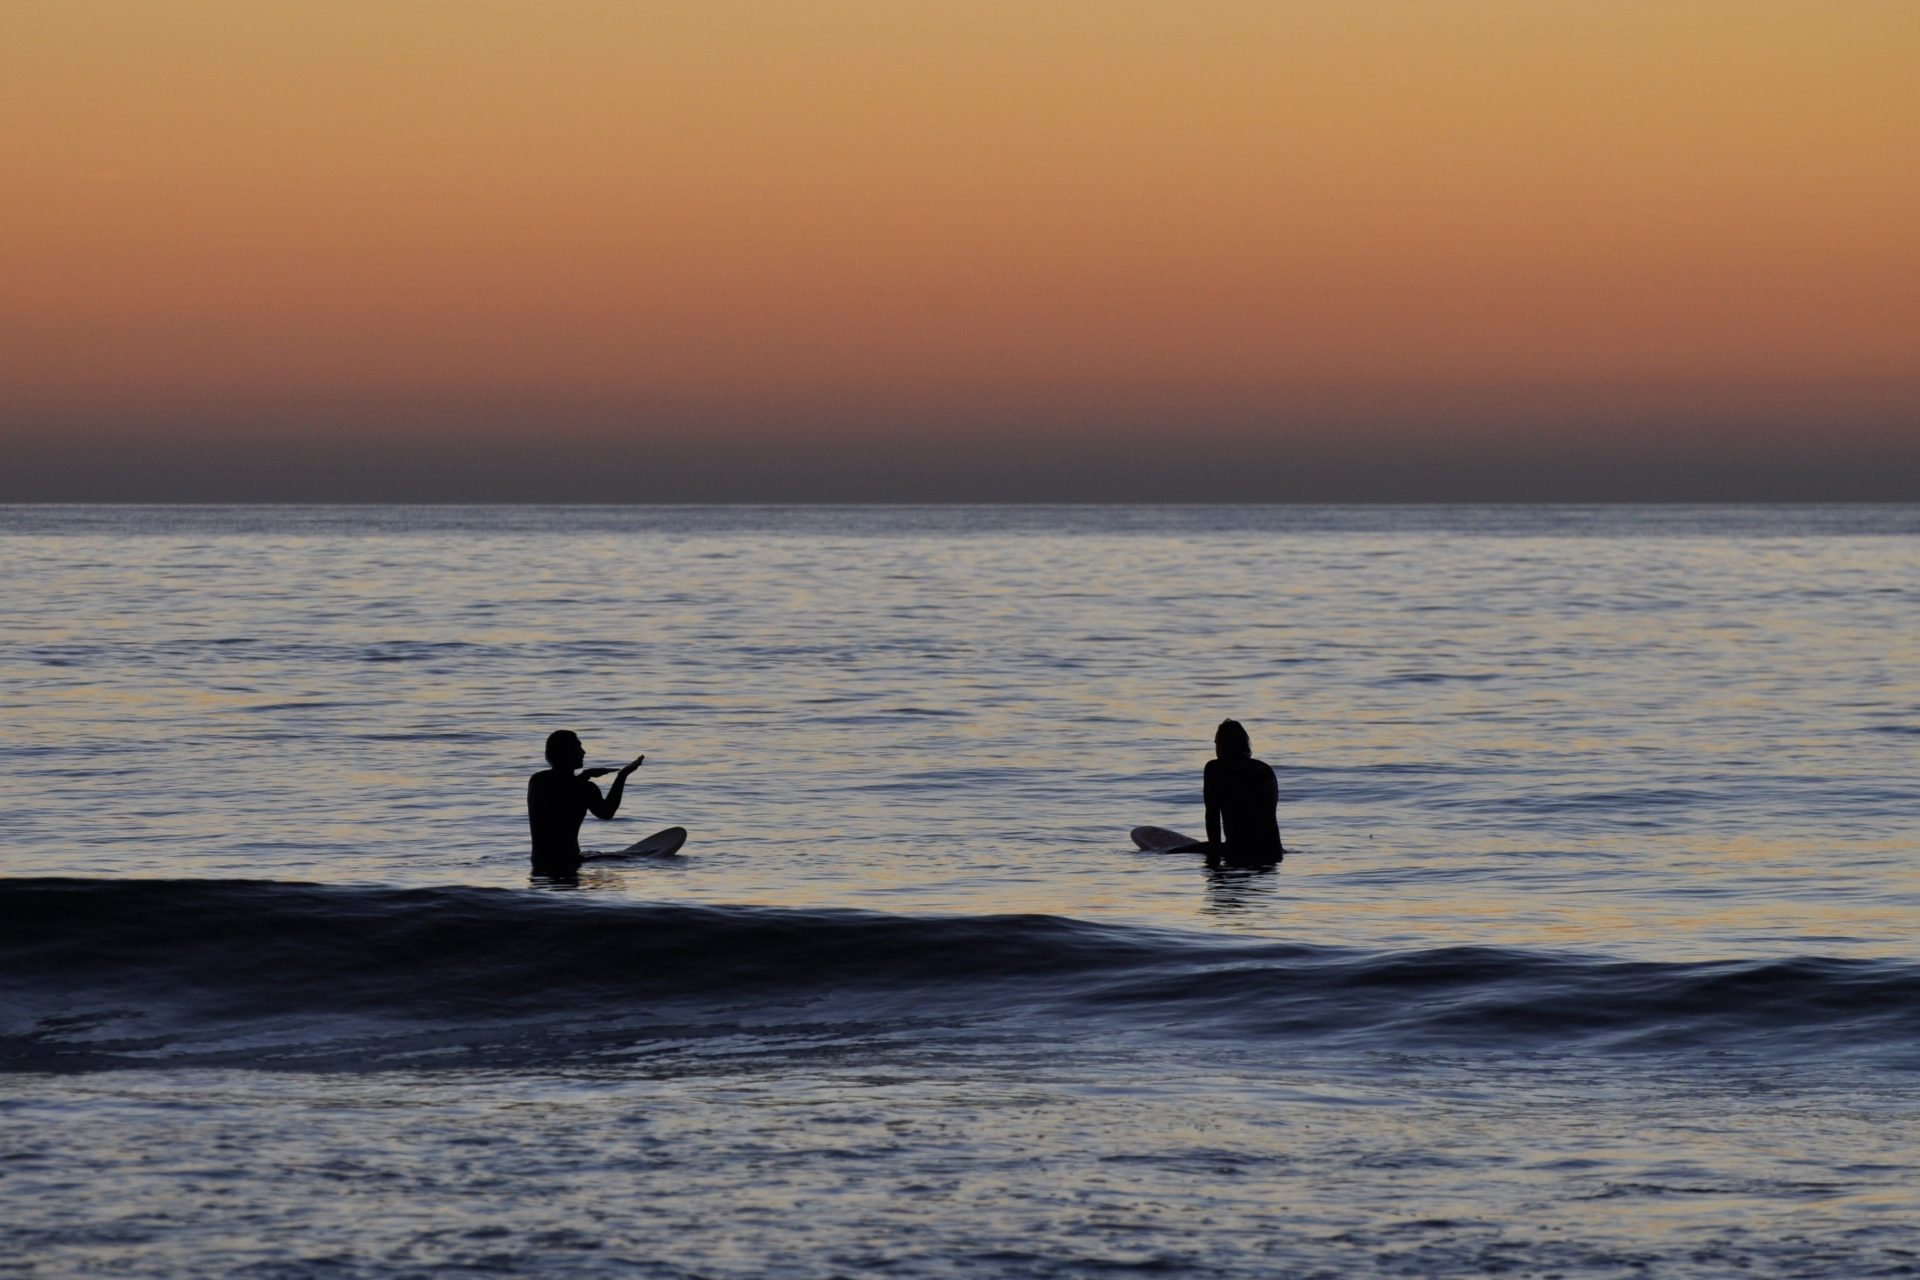 Surfcamp Angebote in Portugal